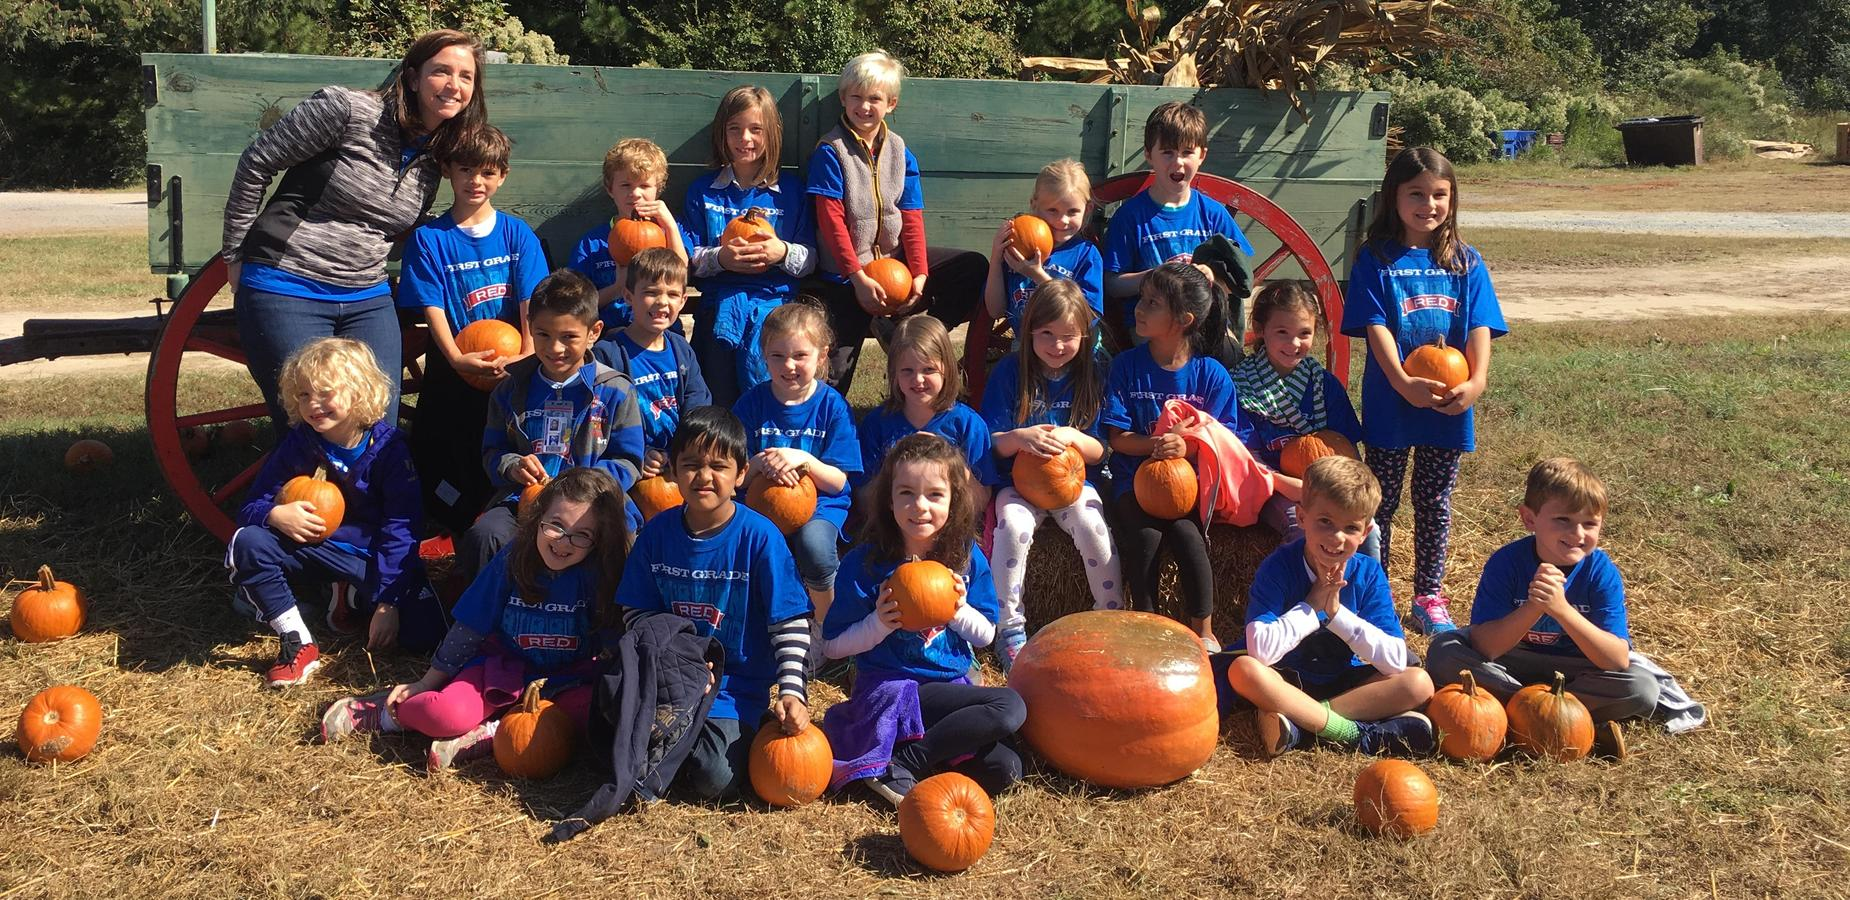 Students with pumpkins on farm field trip